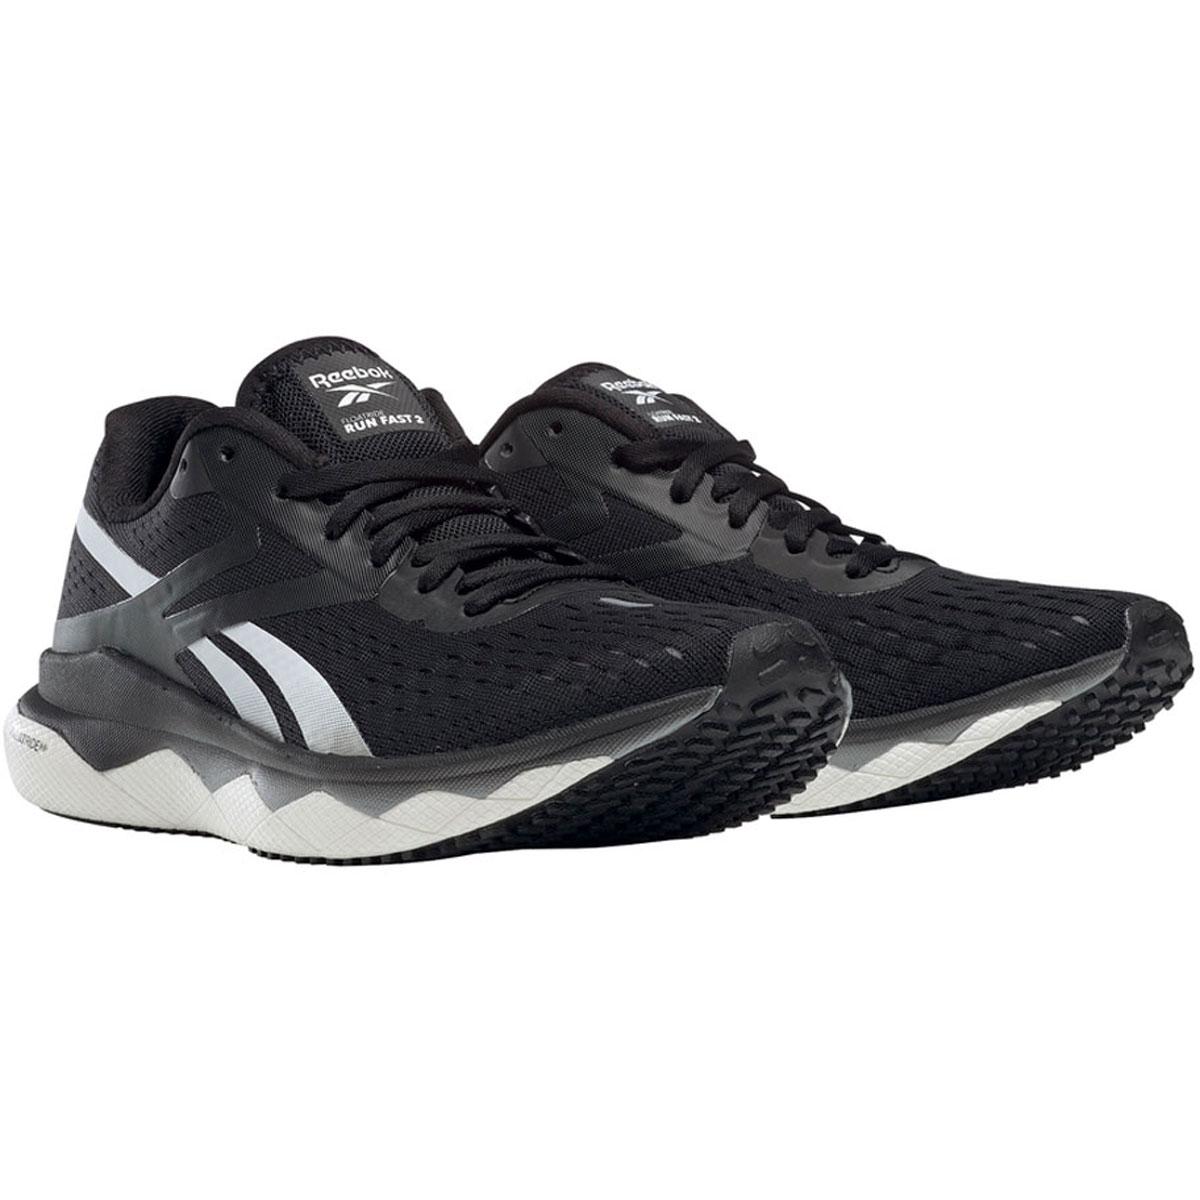 Women's Reebok Floatride Run Fast 2.0 Running Shoe - Color: Black/Pure Grey 3/White (Regular Width) - Size: 5, Black/Pure Grey 3/White, large, image 2